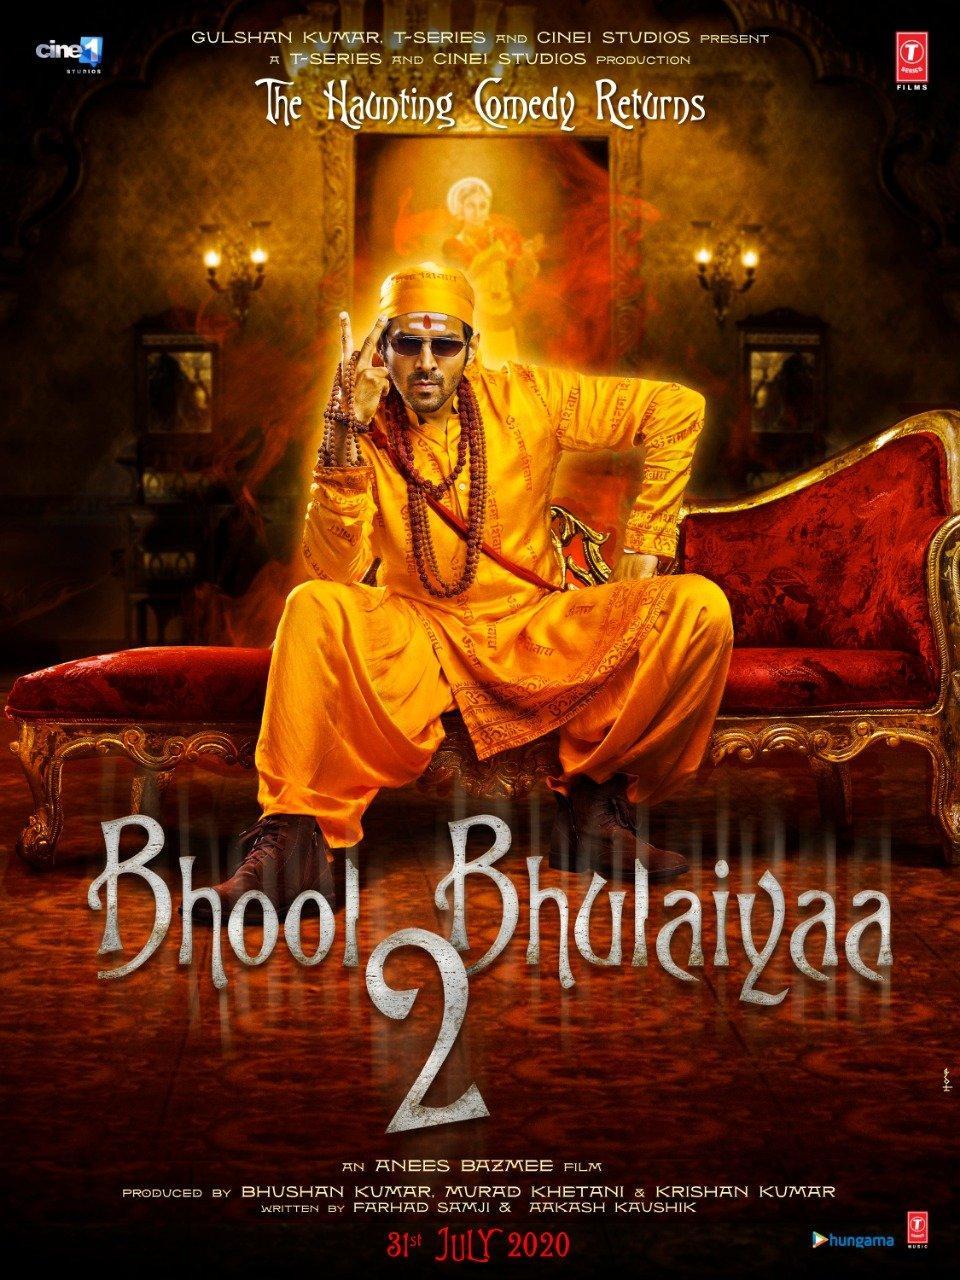 Bhool Bhulaiyaa 2 Picture Gallery